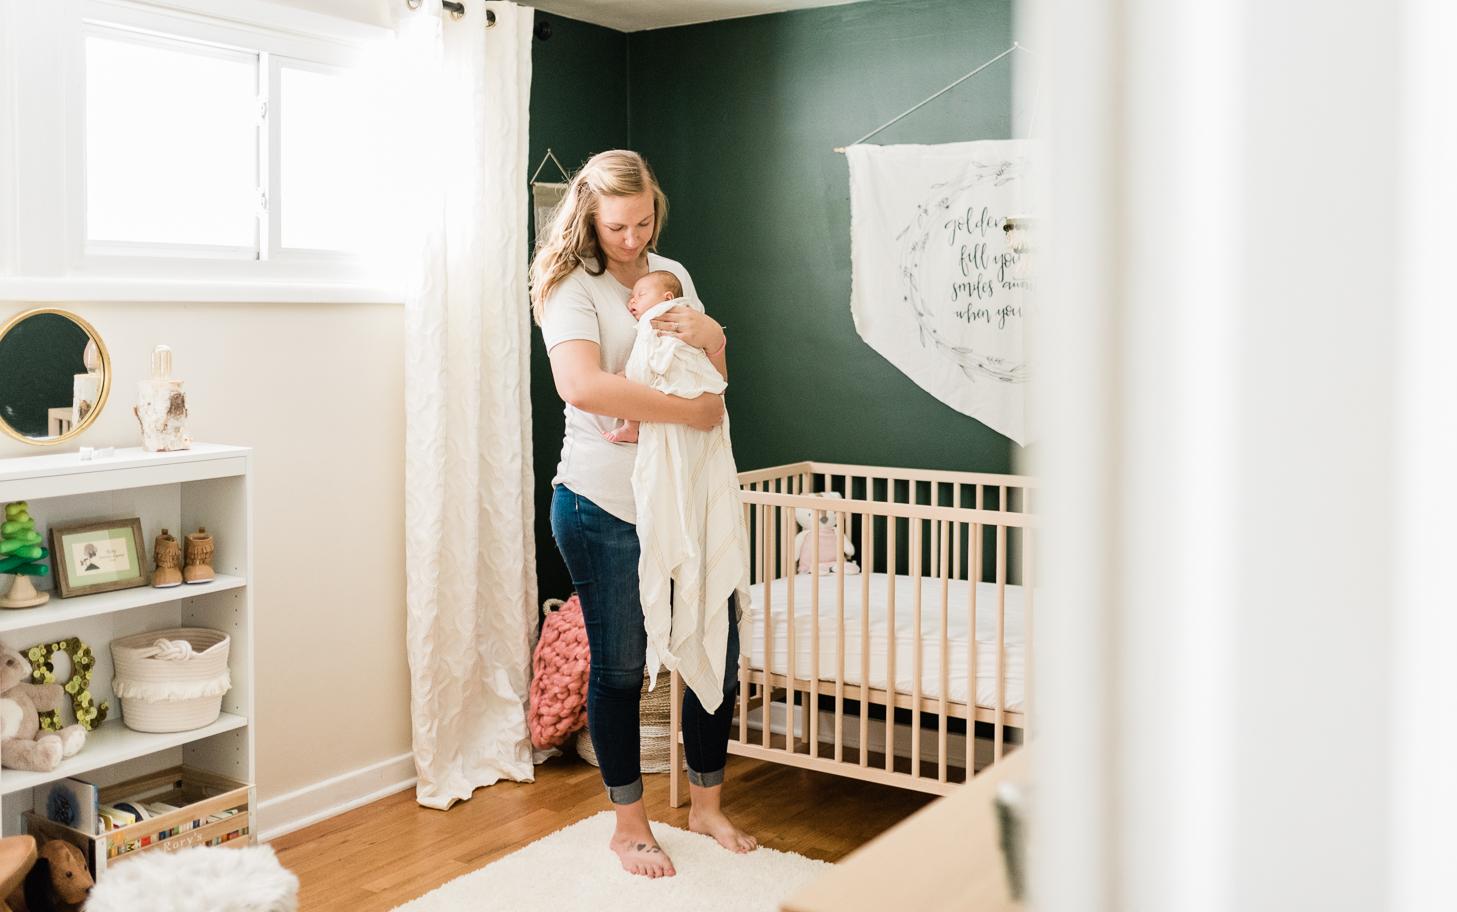 Baltimore-maryland-lifestyle-photographer-newborn-portrait-mini session-branding-BKLP-Breanna Kuhlmann.jpg